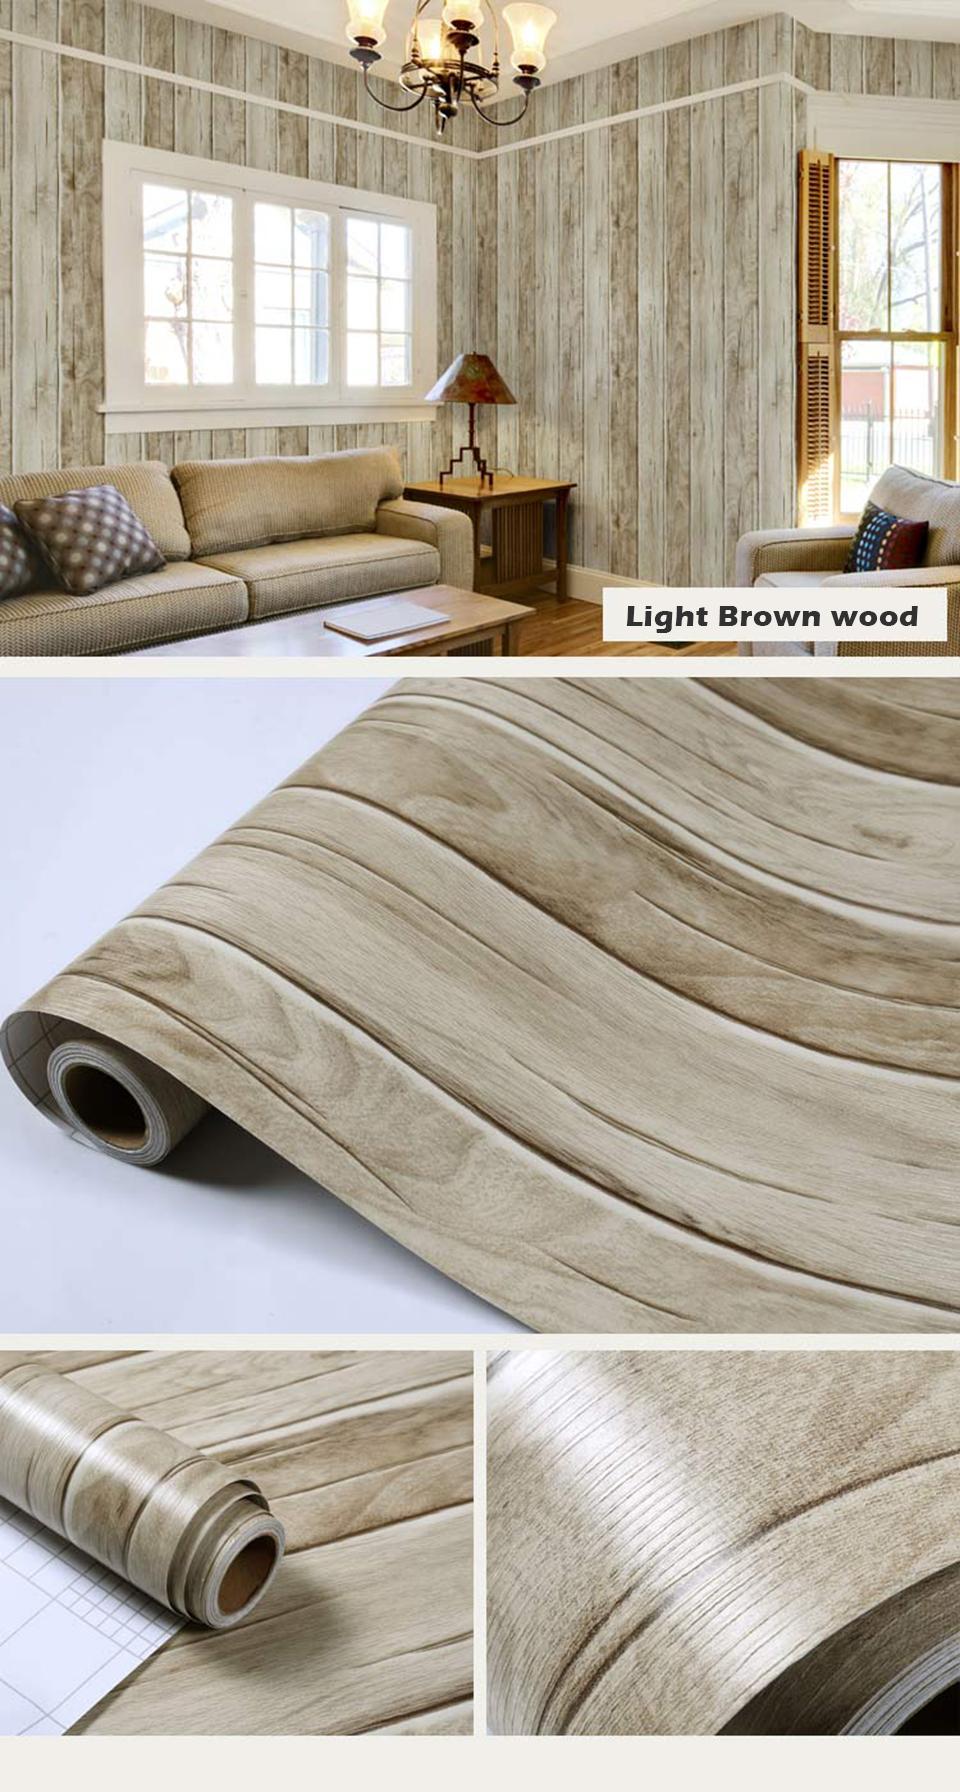 Wood Laotian waterproof Kip 9